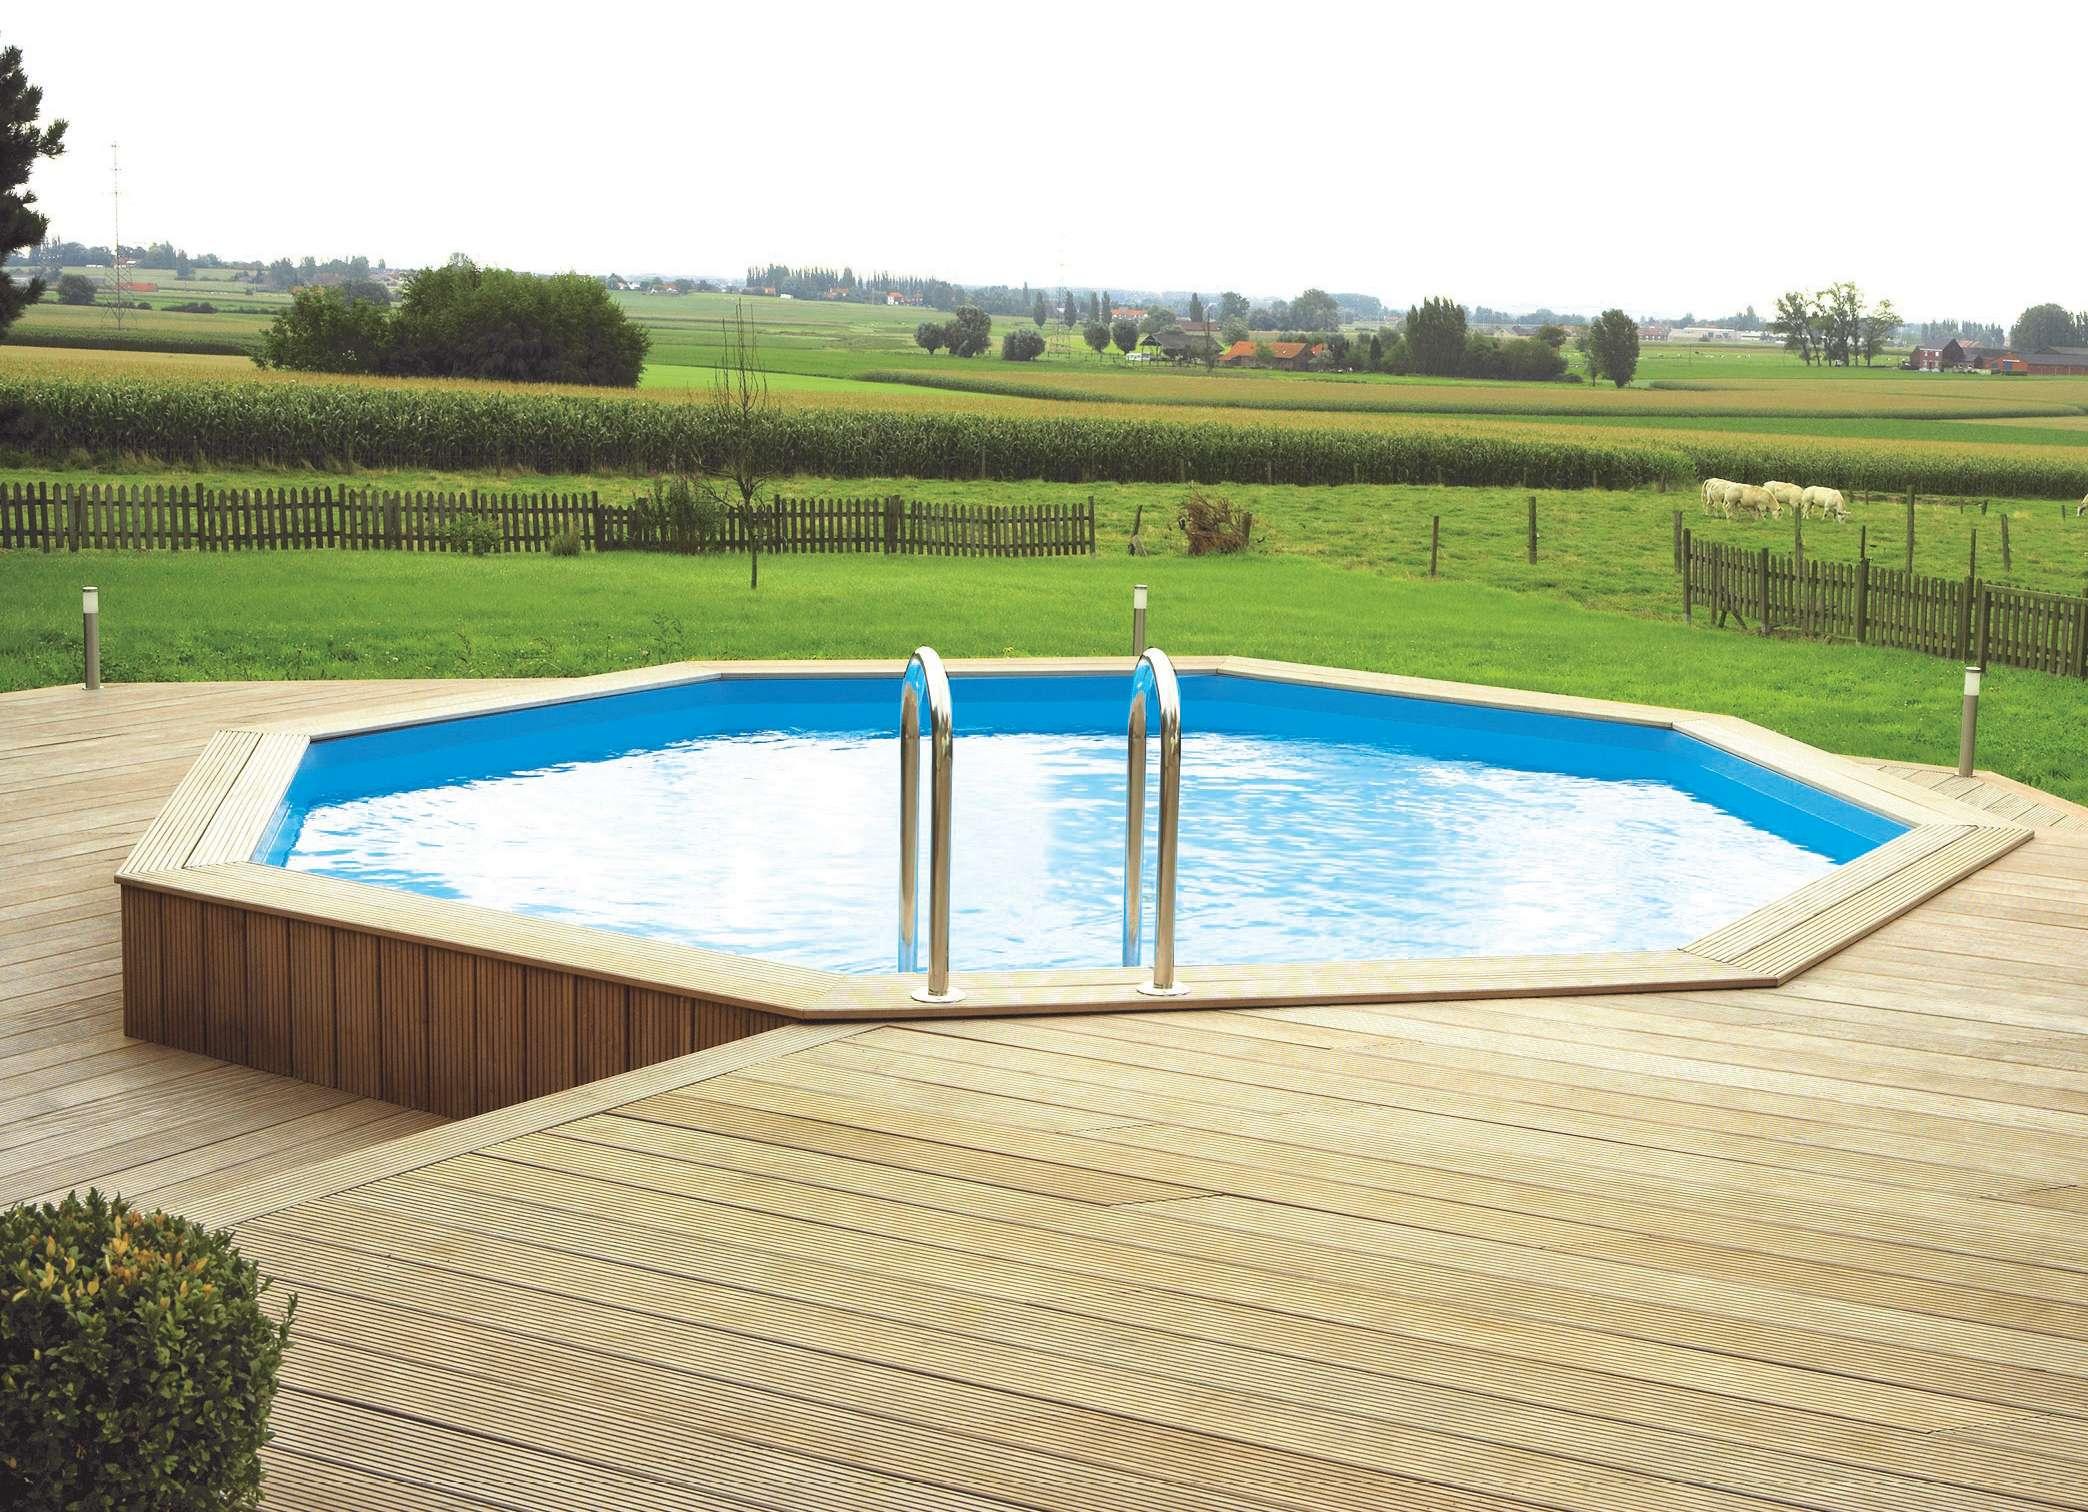 Piscina in legno ocea pool ronde 1000 piscine for 1000 piscine